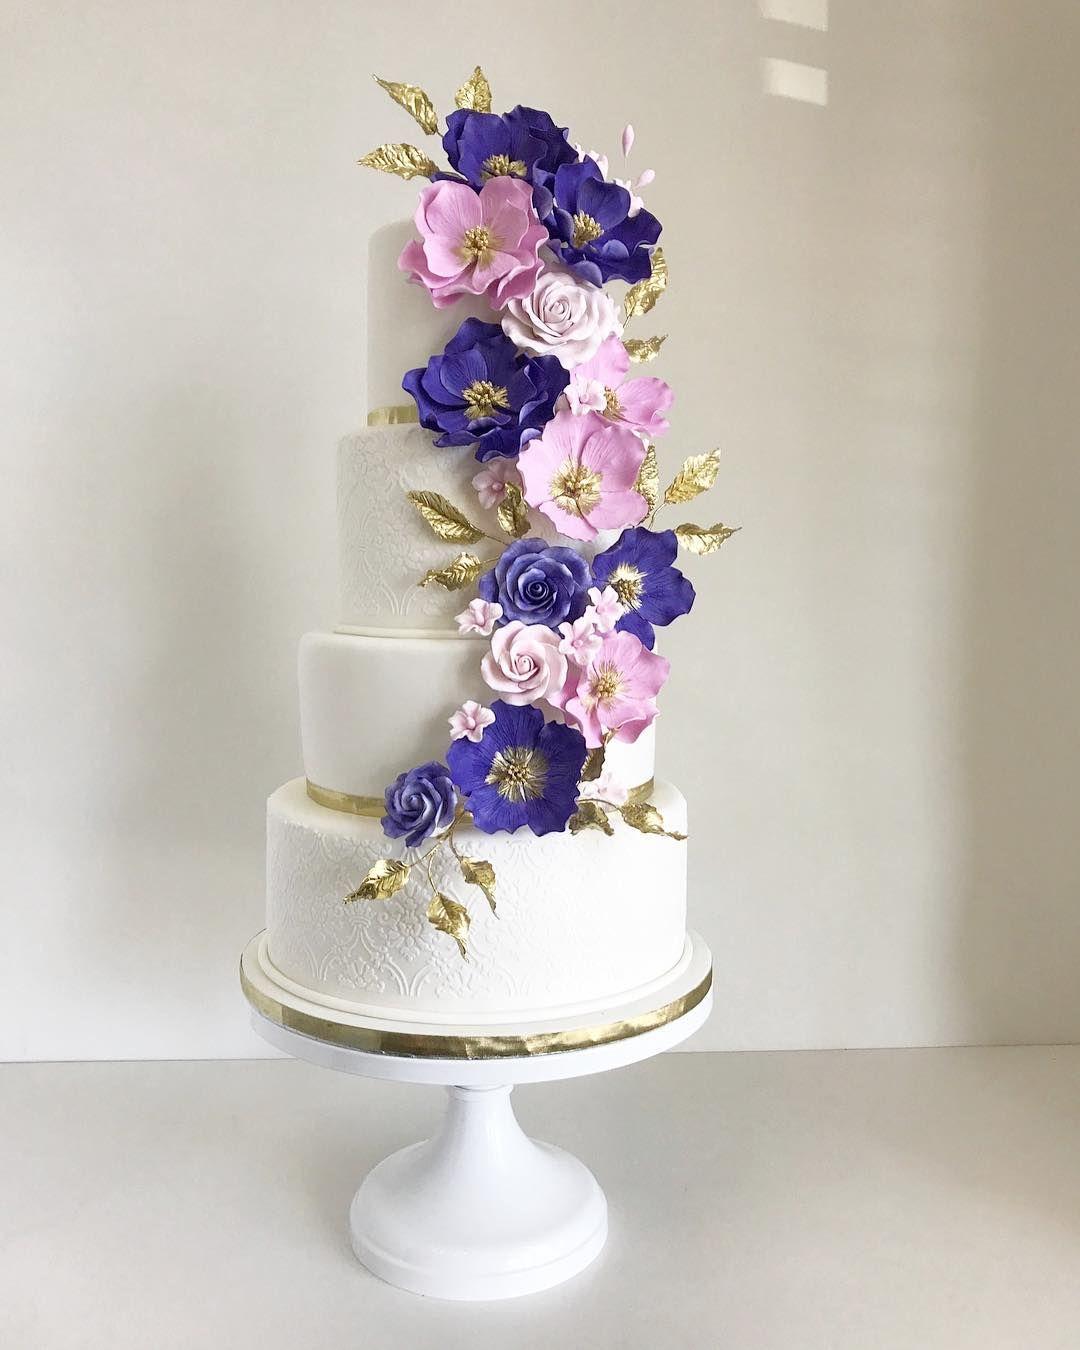 22 Beautiful wedding cakes to inspire you : White wedding cake with pink and indigo sugar flowers